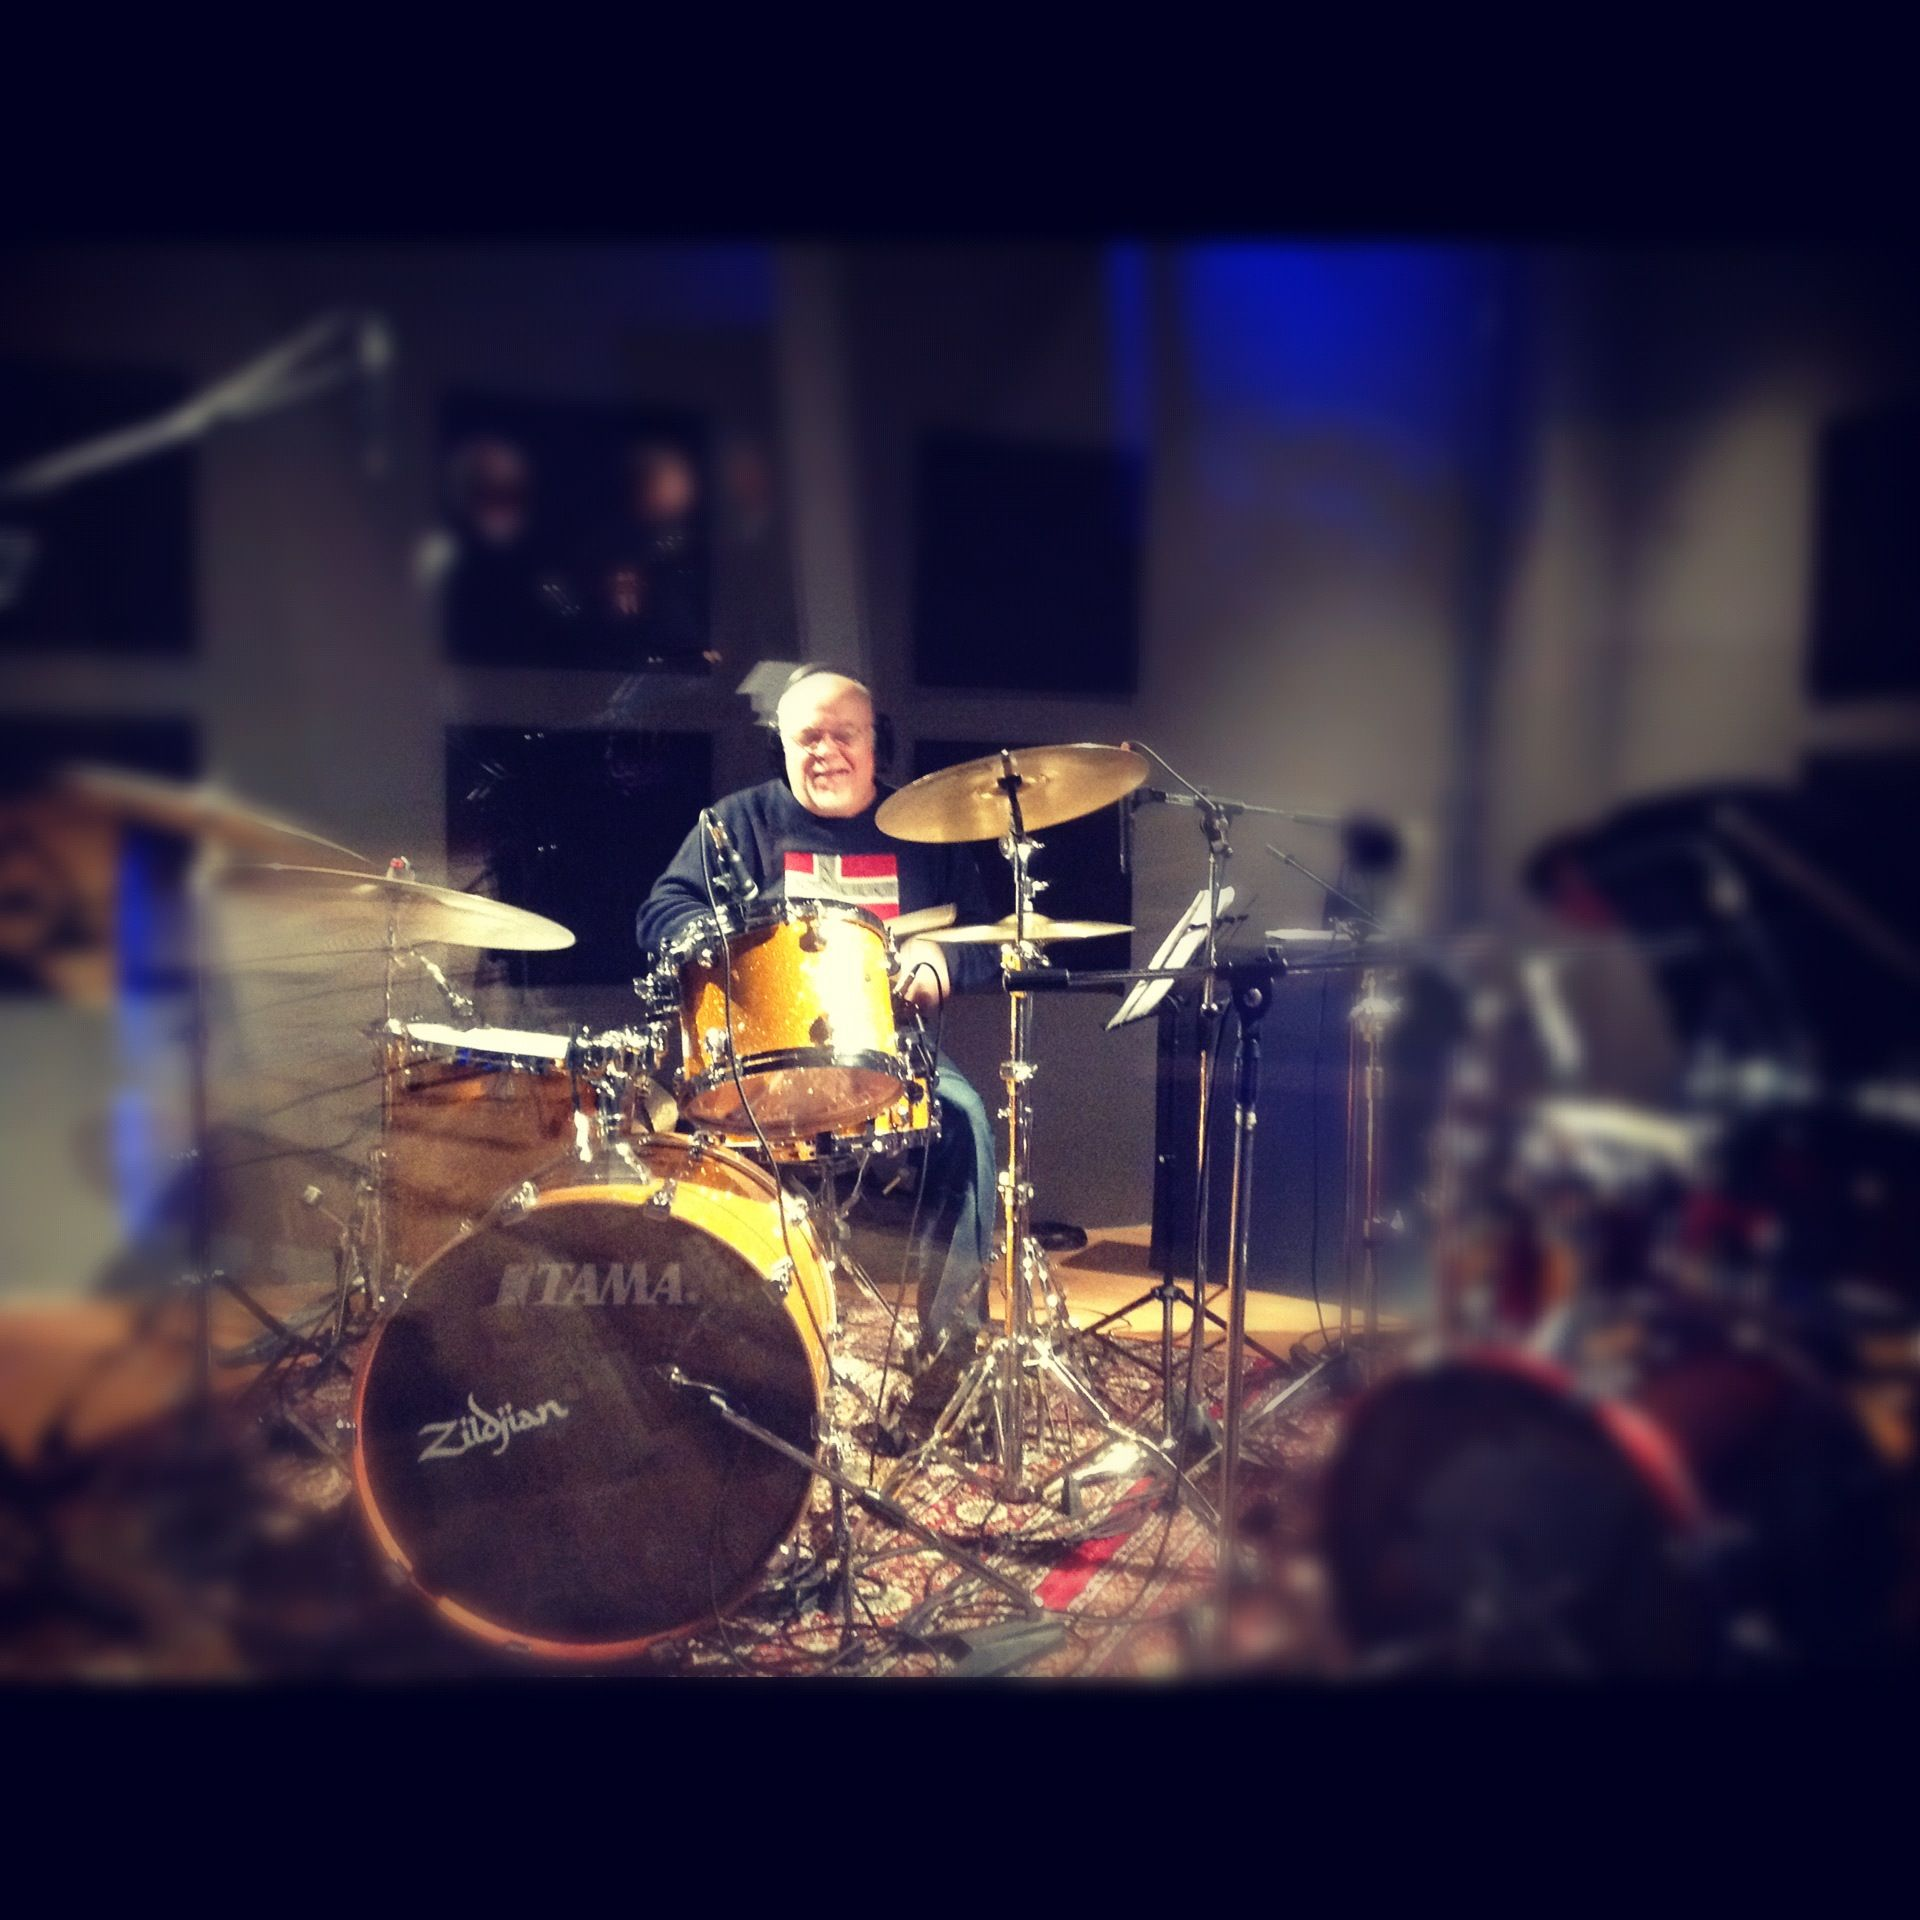 Ellade Bandini With Images Drums Drum Room